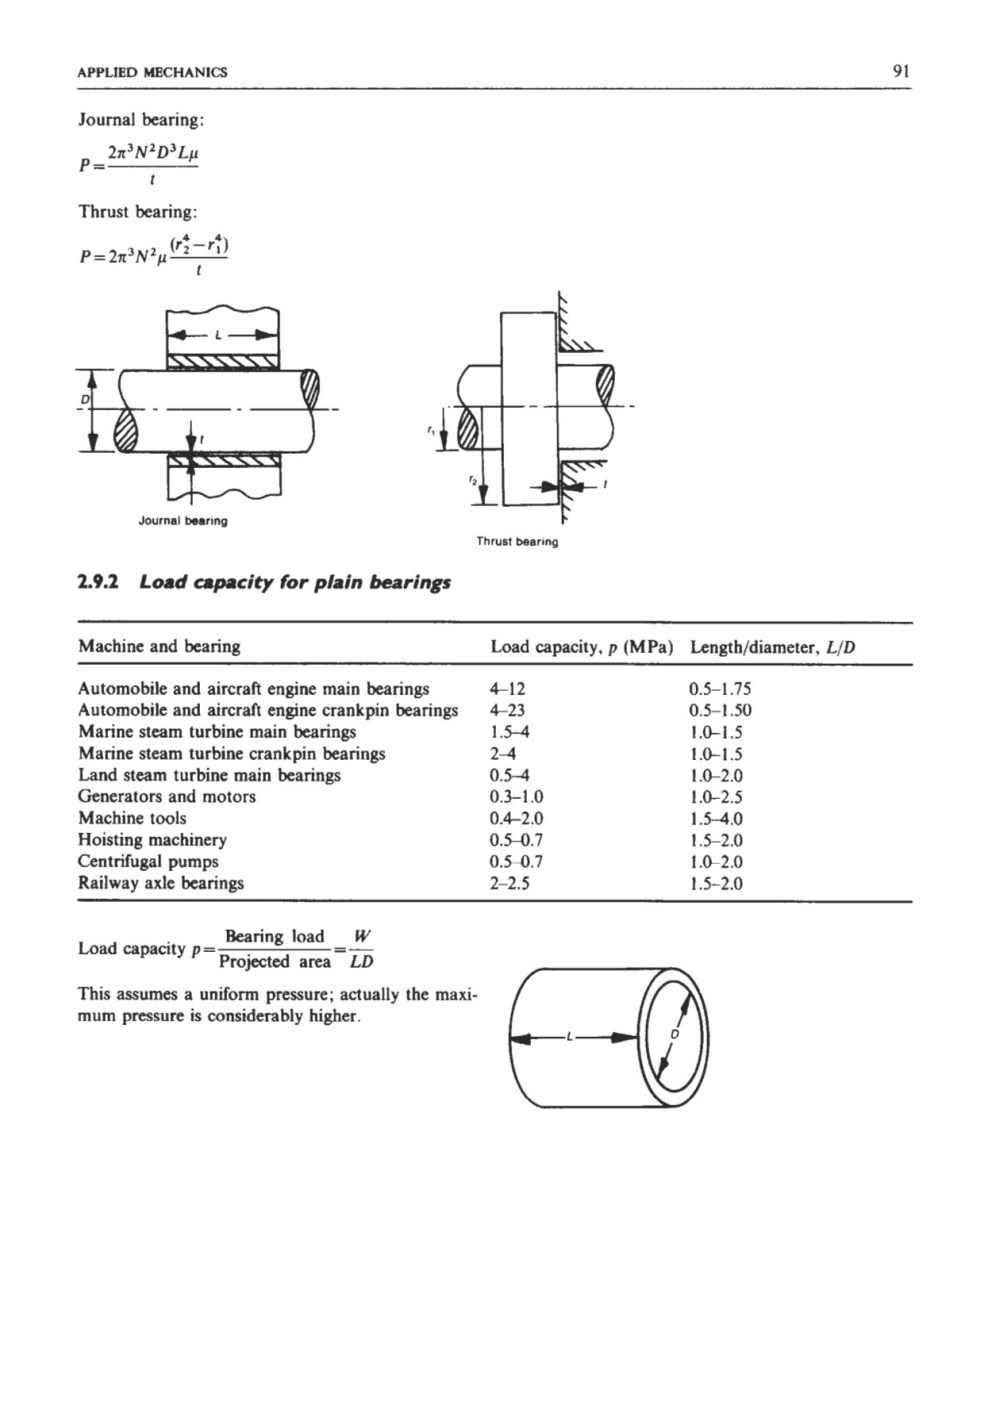 medium resolution of mechanical engineer s data handbook pages 101 150 text version fliphtml5